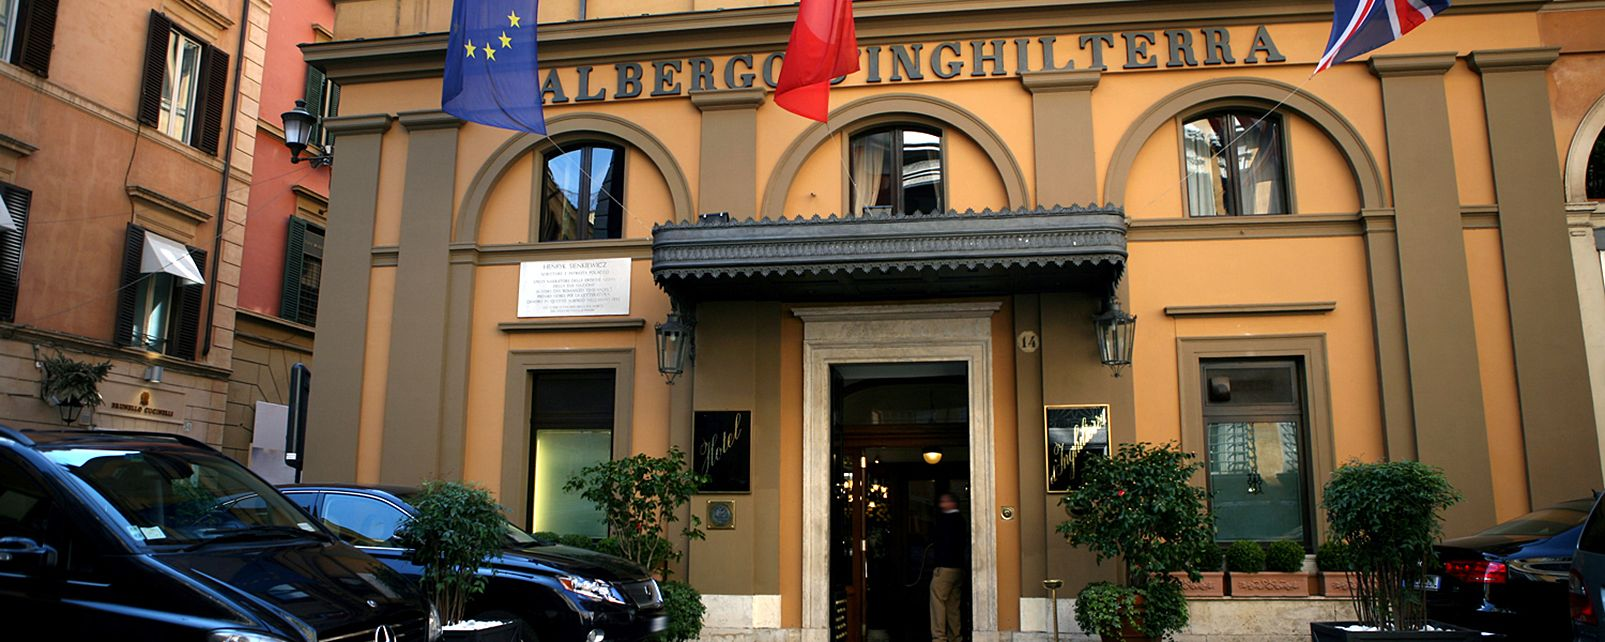 Hôtel d'Inghilterra